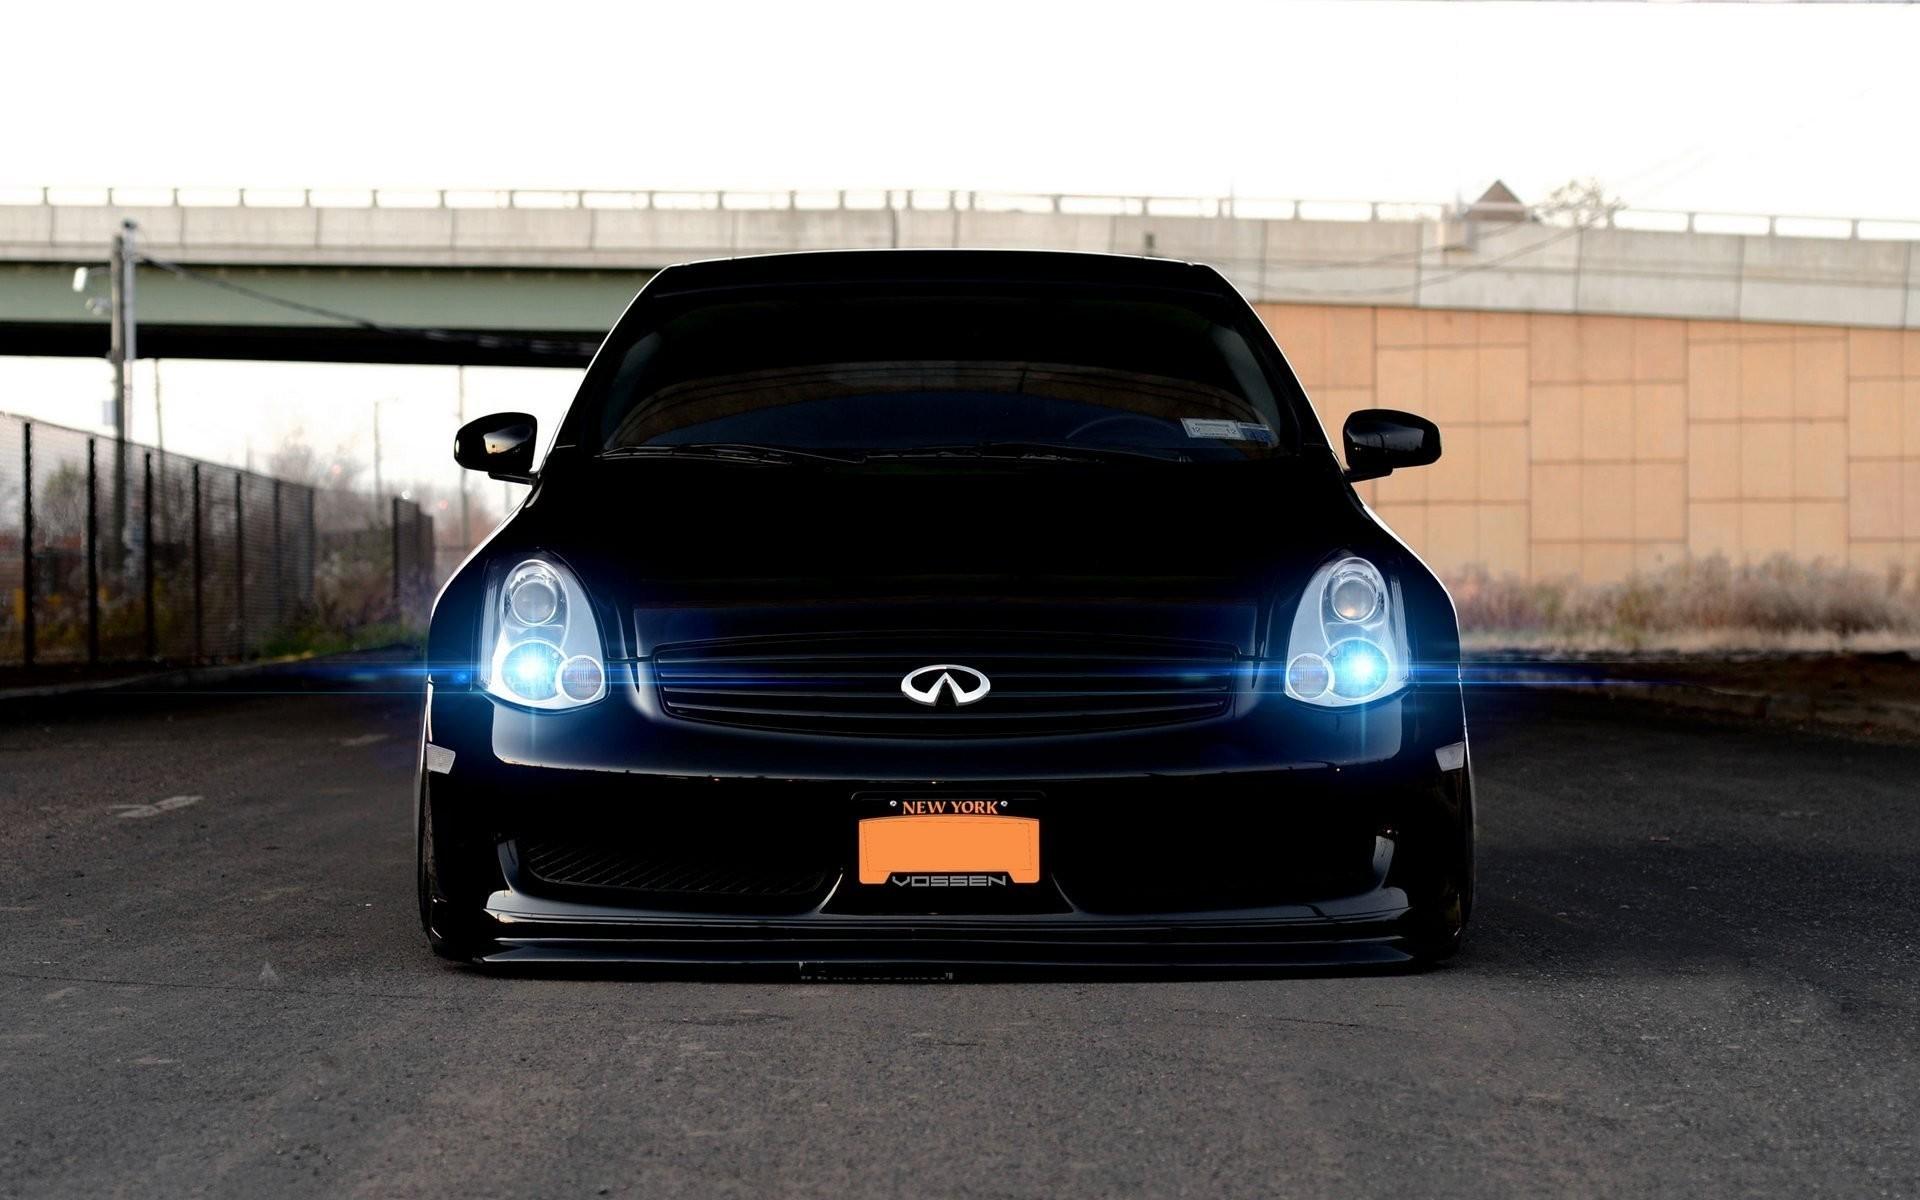 car wallpapers black infiniti g35 tuning vossen vehicles wallpapers black  infinity tuning vossen front beautiful machine